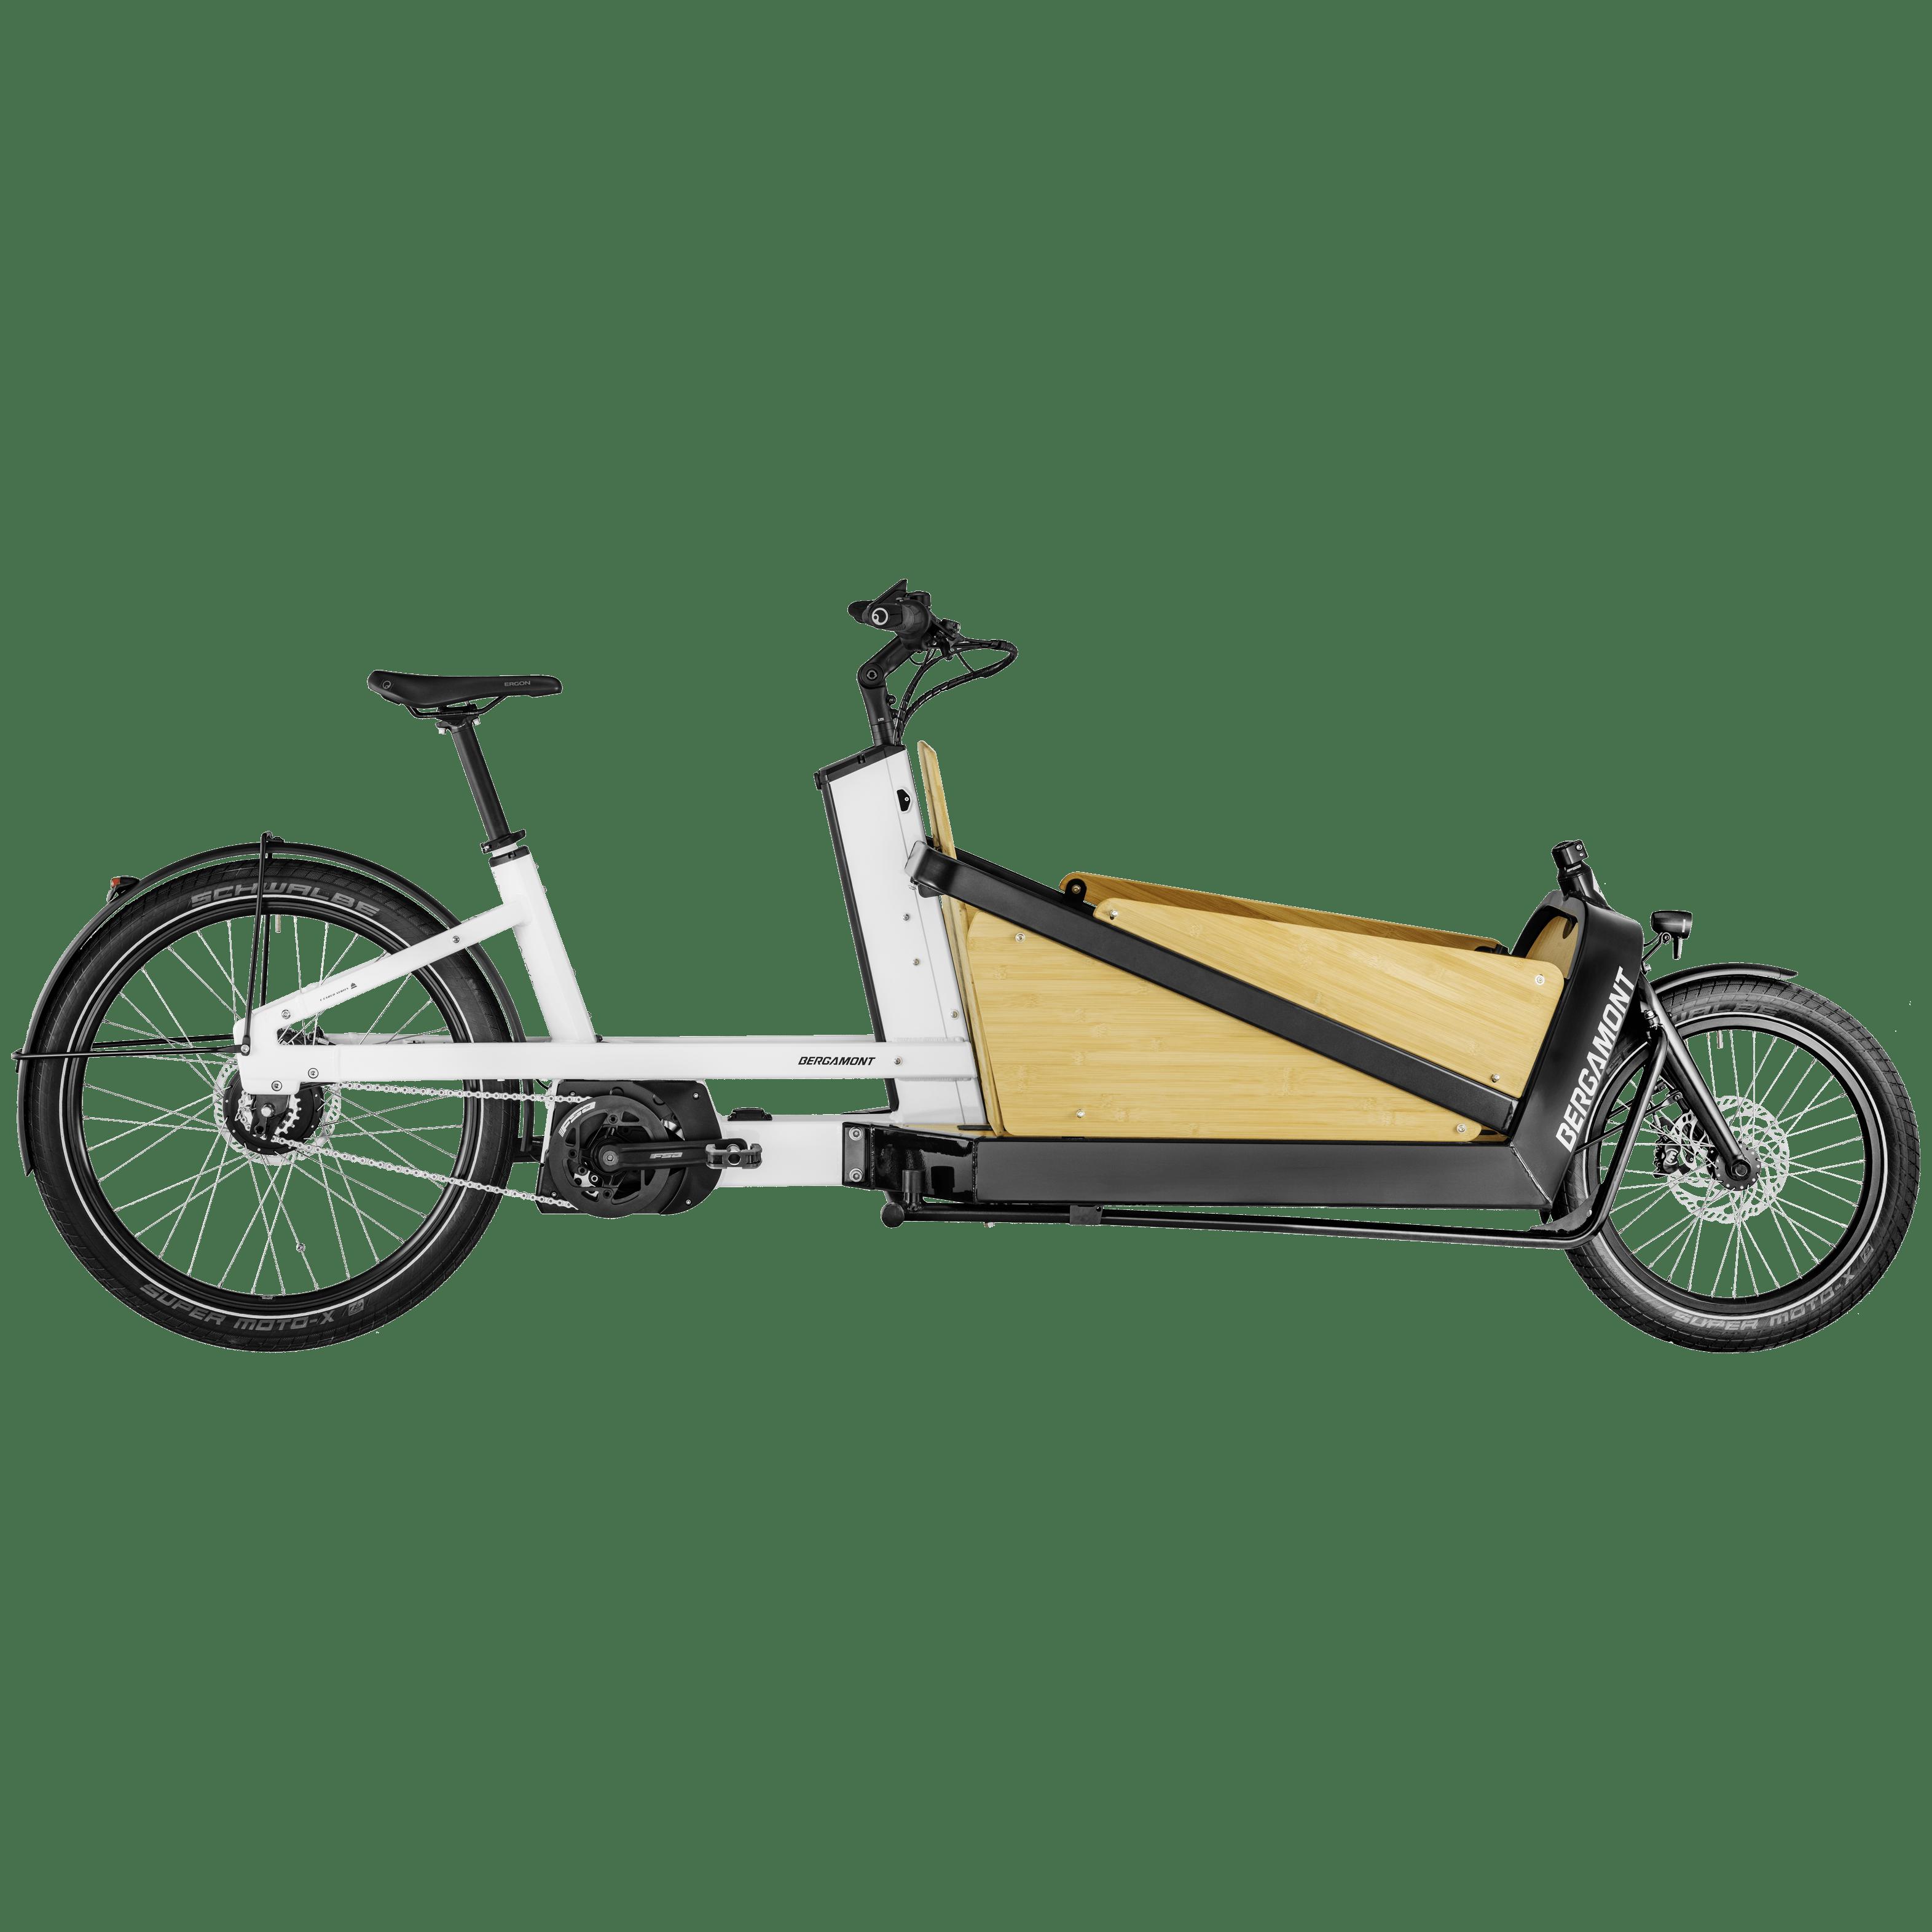 Esprit vélo BERGAMONT E-CARGOVILLE LJ EXPERT A